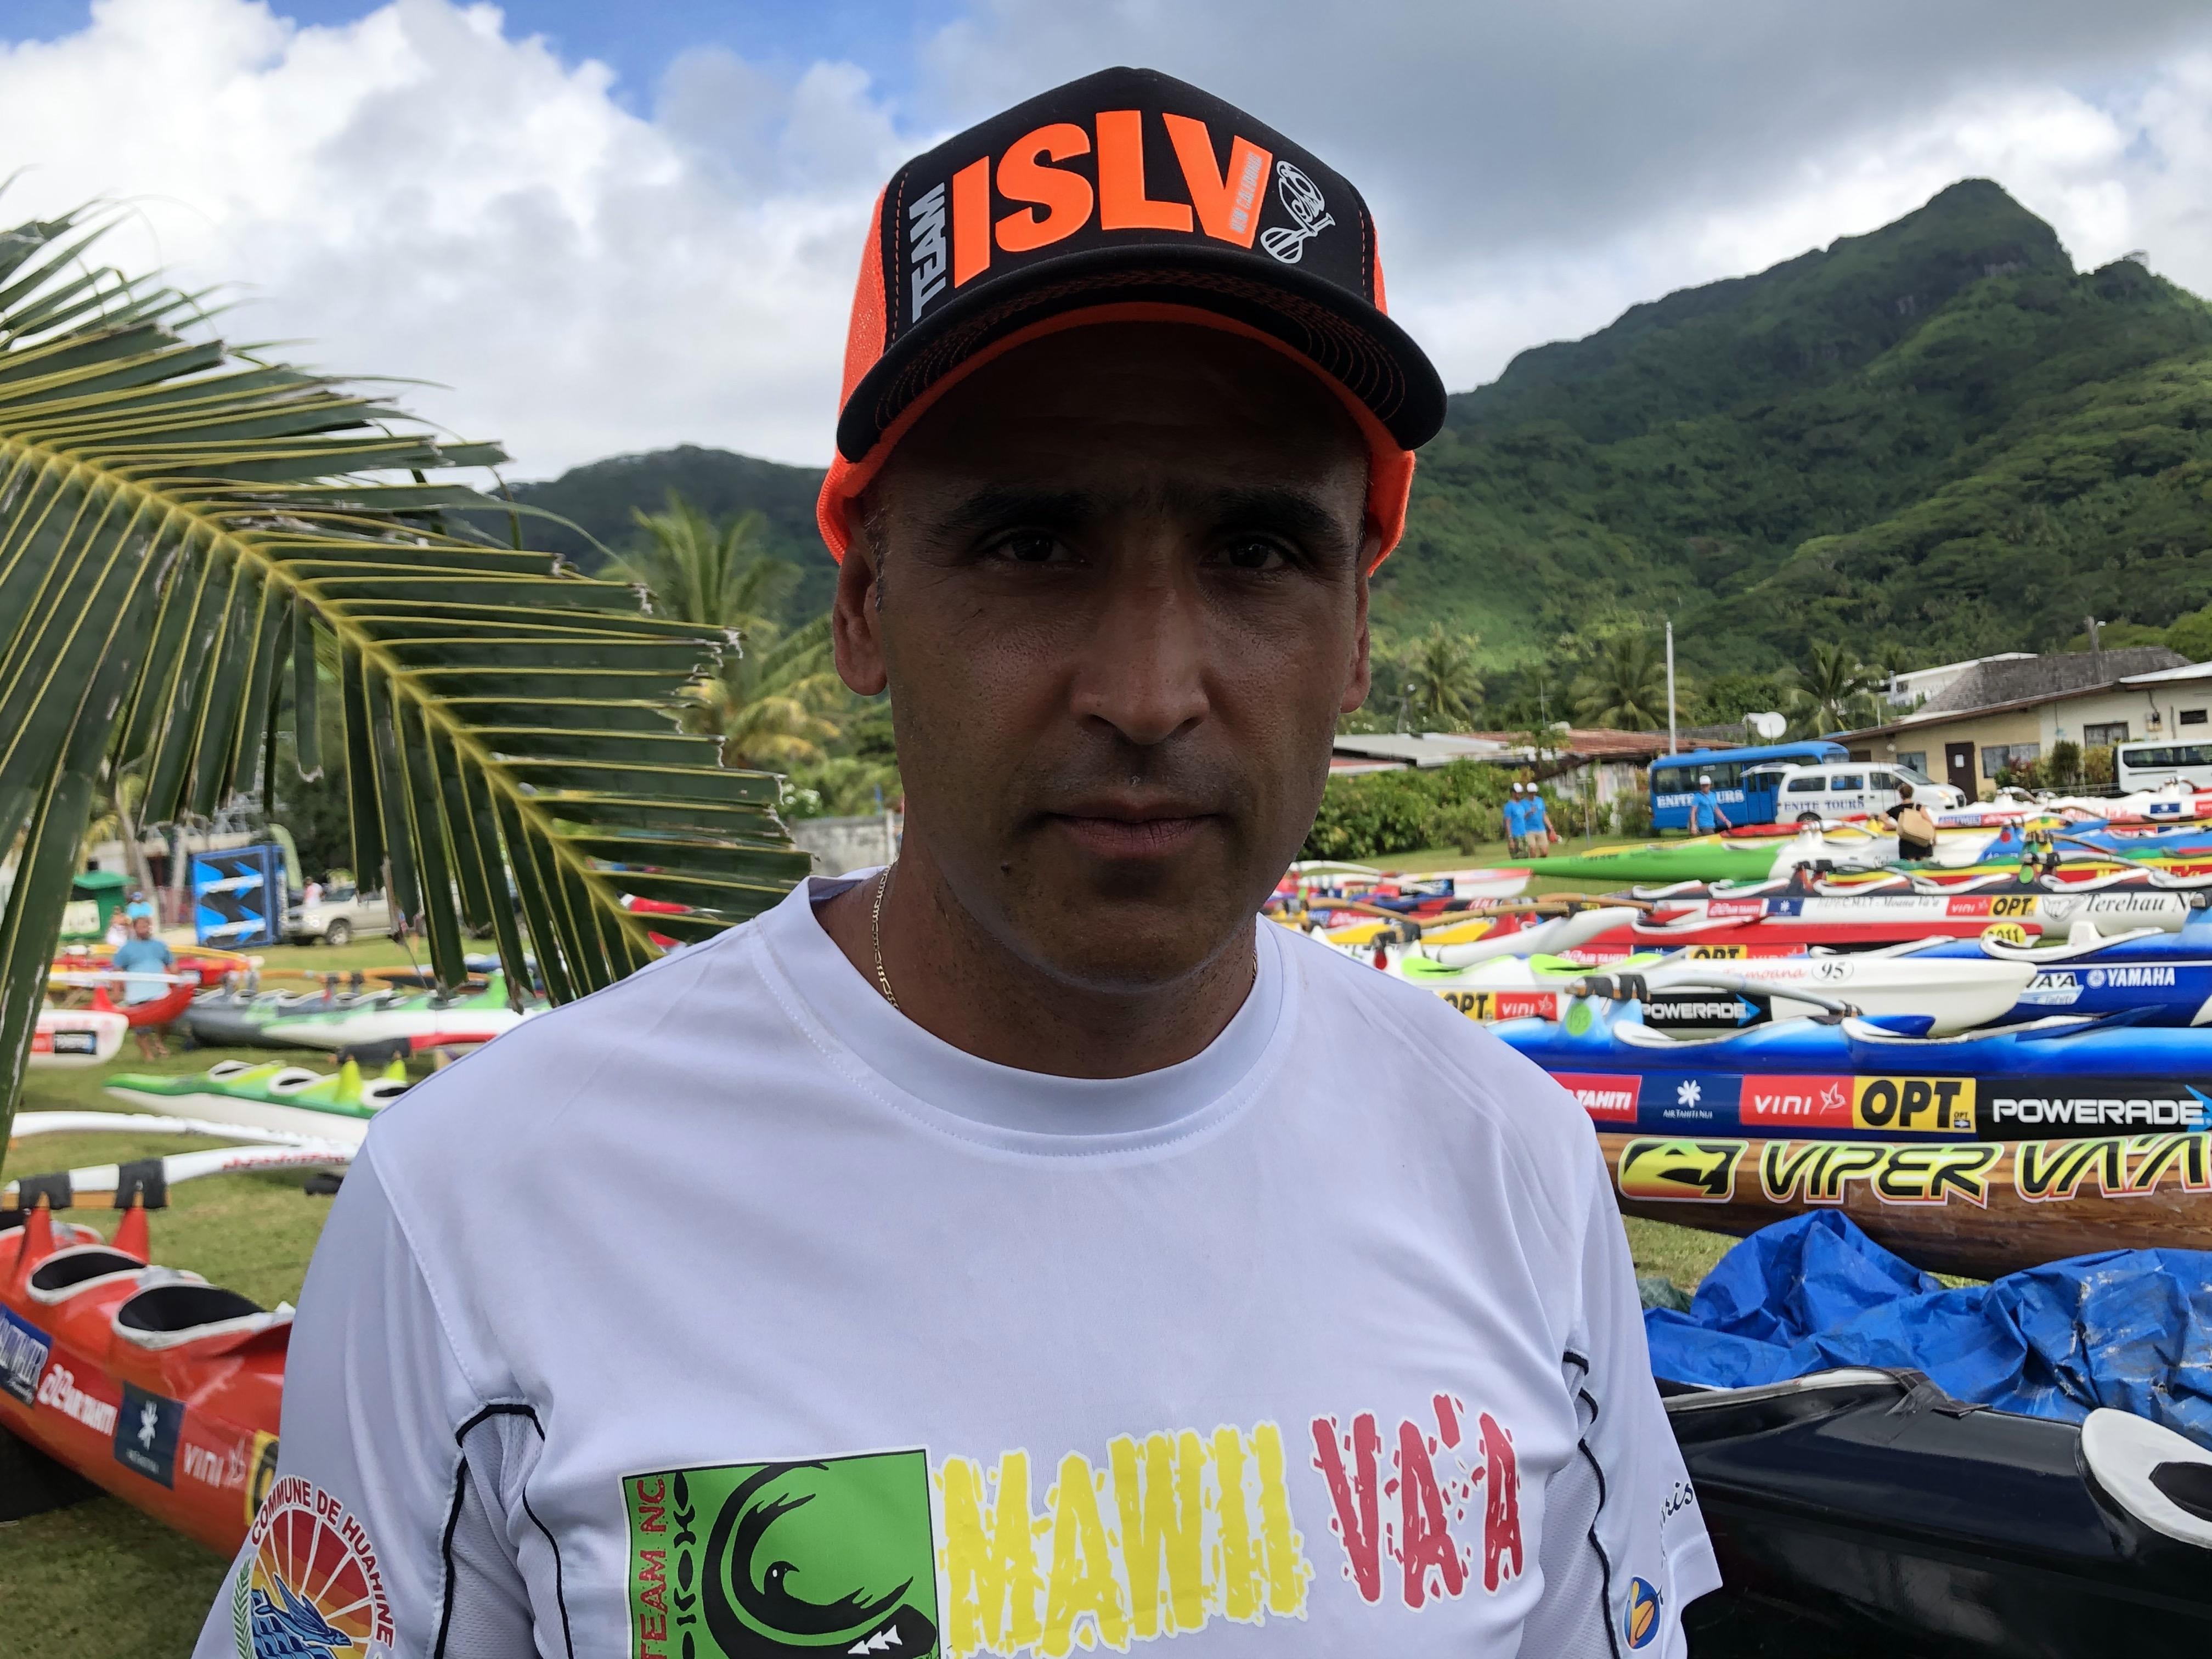 Hawaiki Nui Va'a : ces rameurs venus d'ailleurs